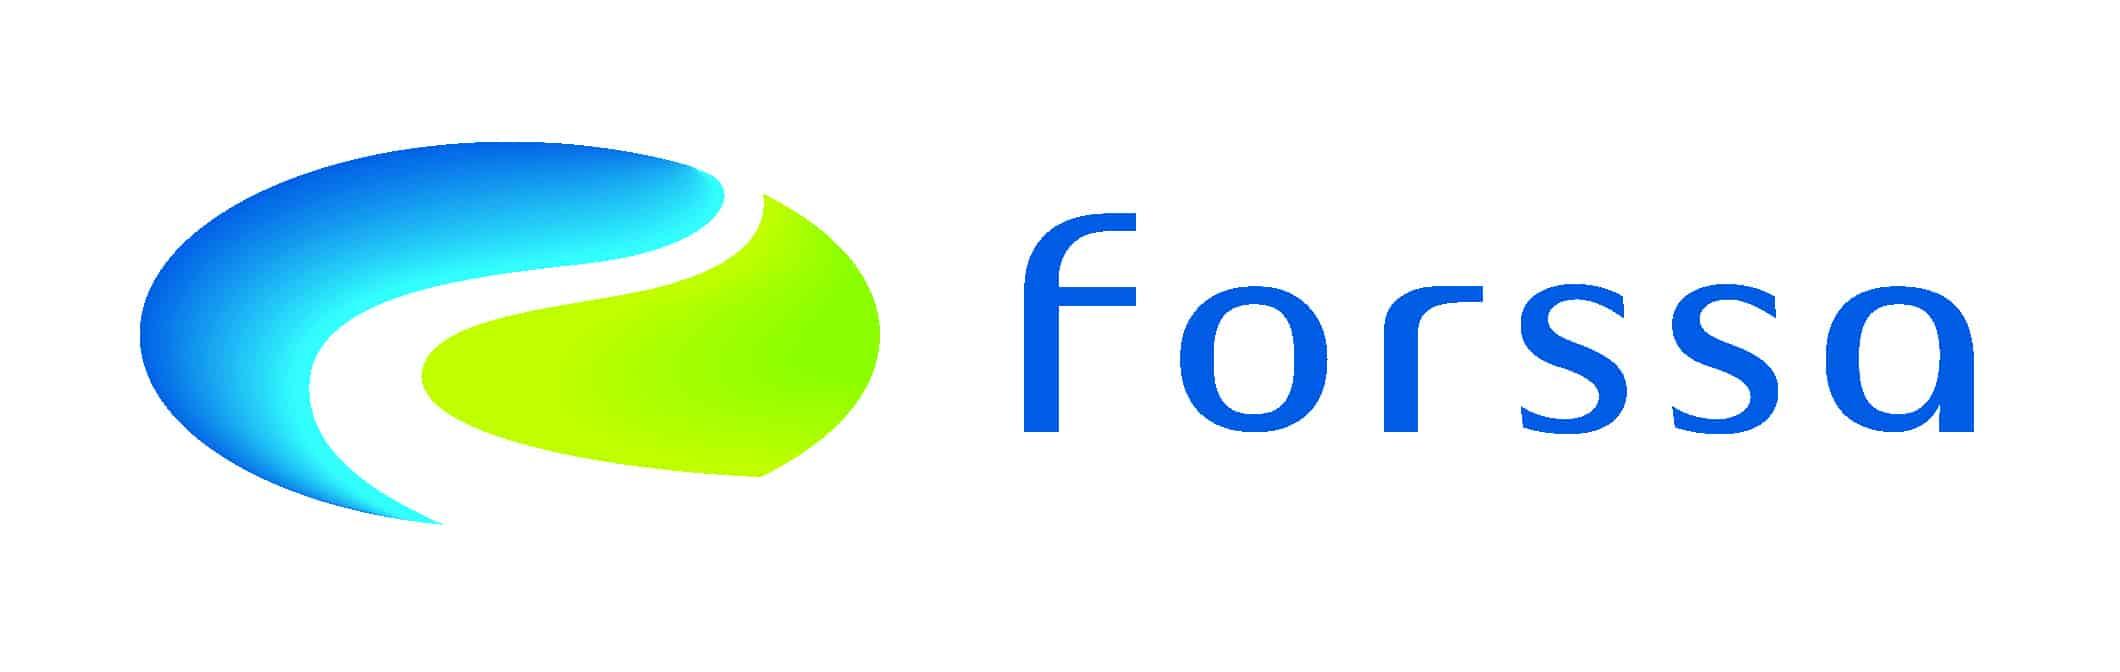 Forssa logo